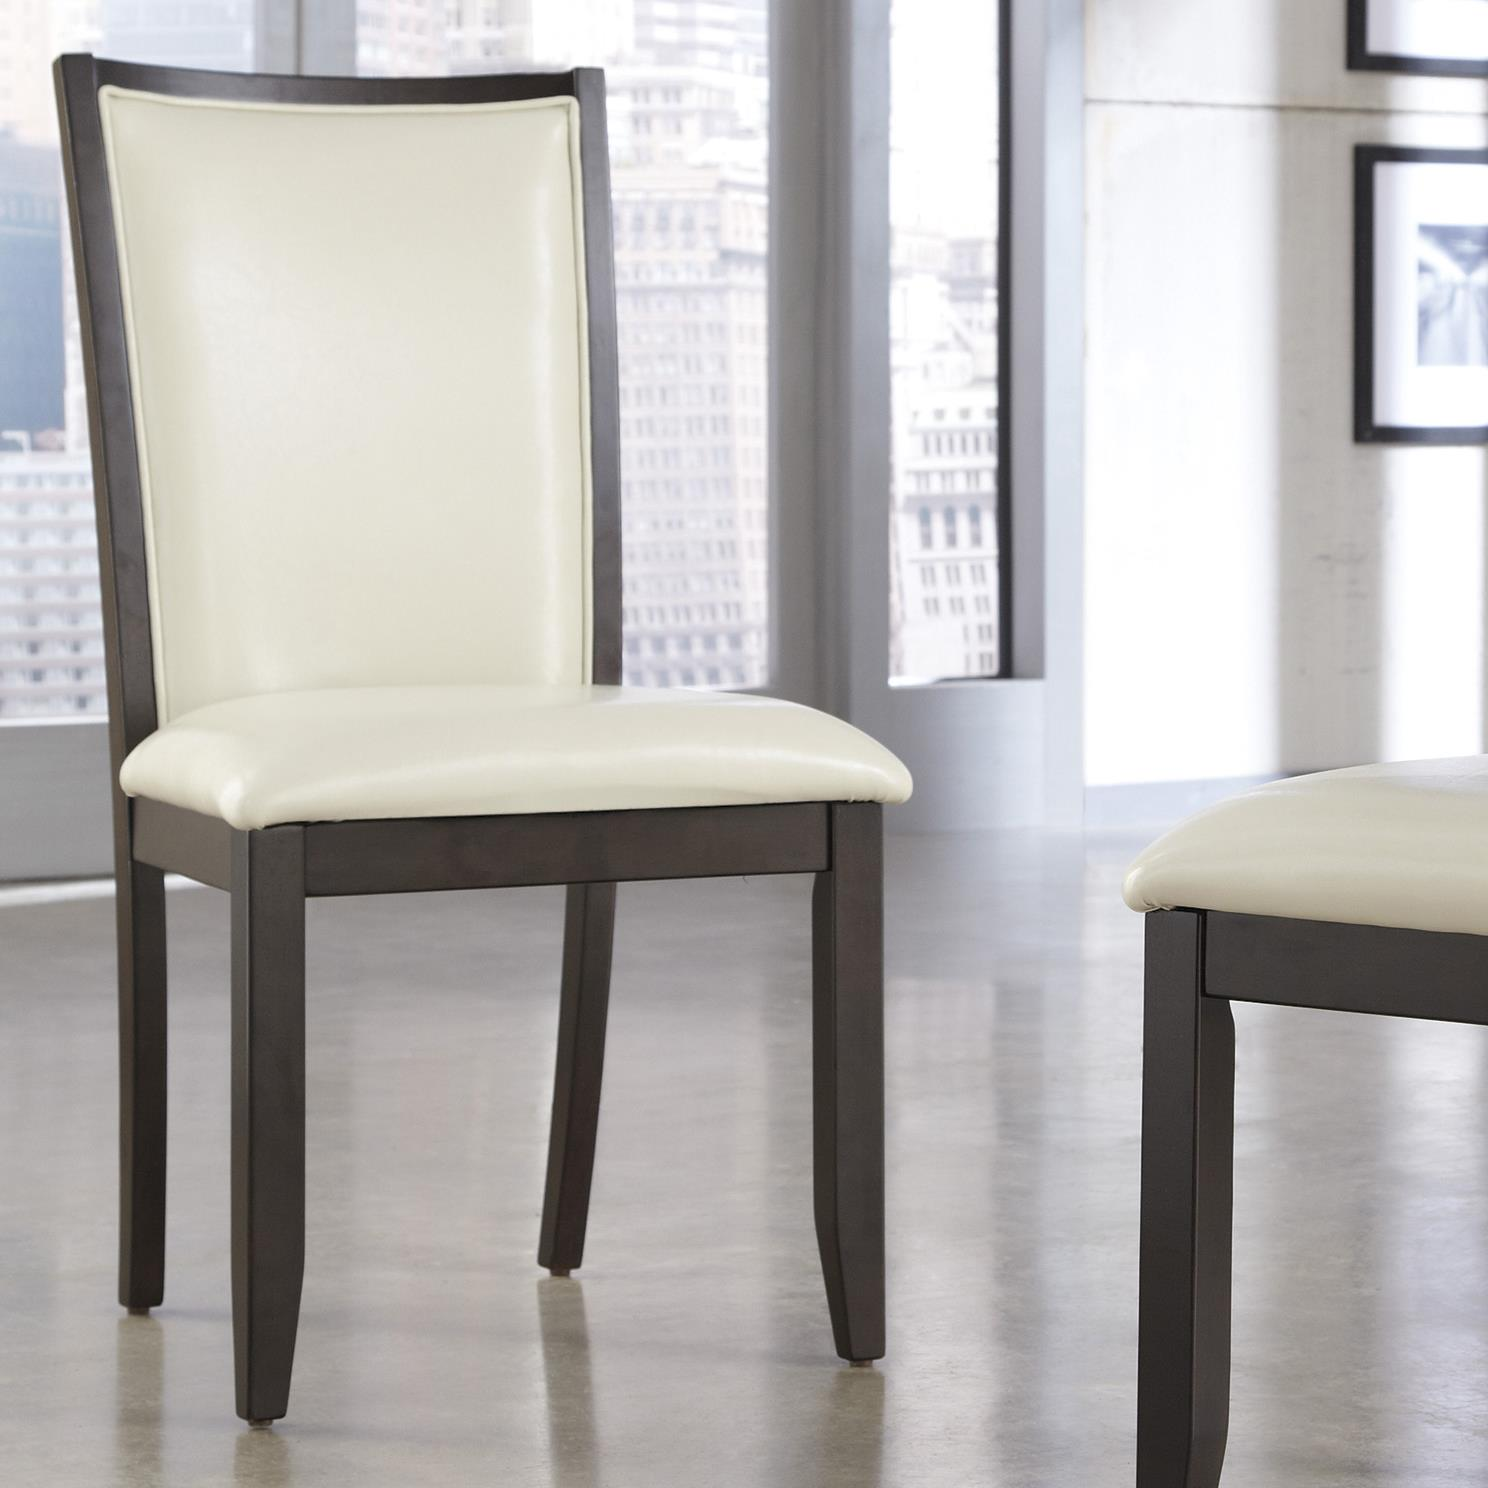 Ashley Furniture Trishelle Dining Upholstered Side Chair - Item Number: D550-03